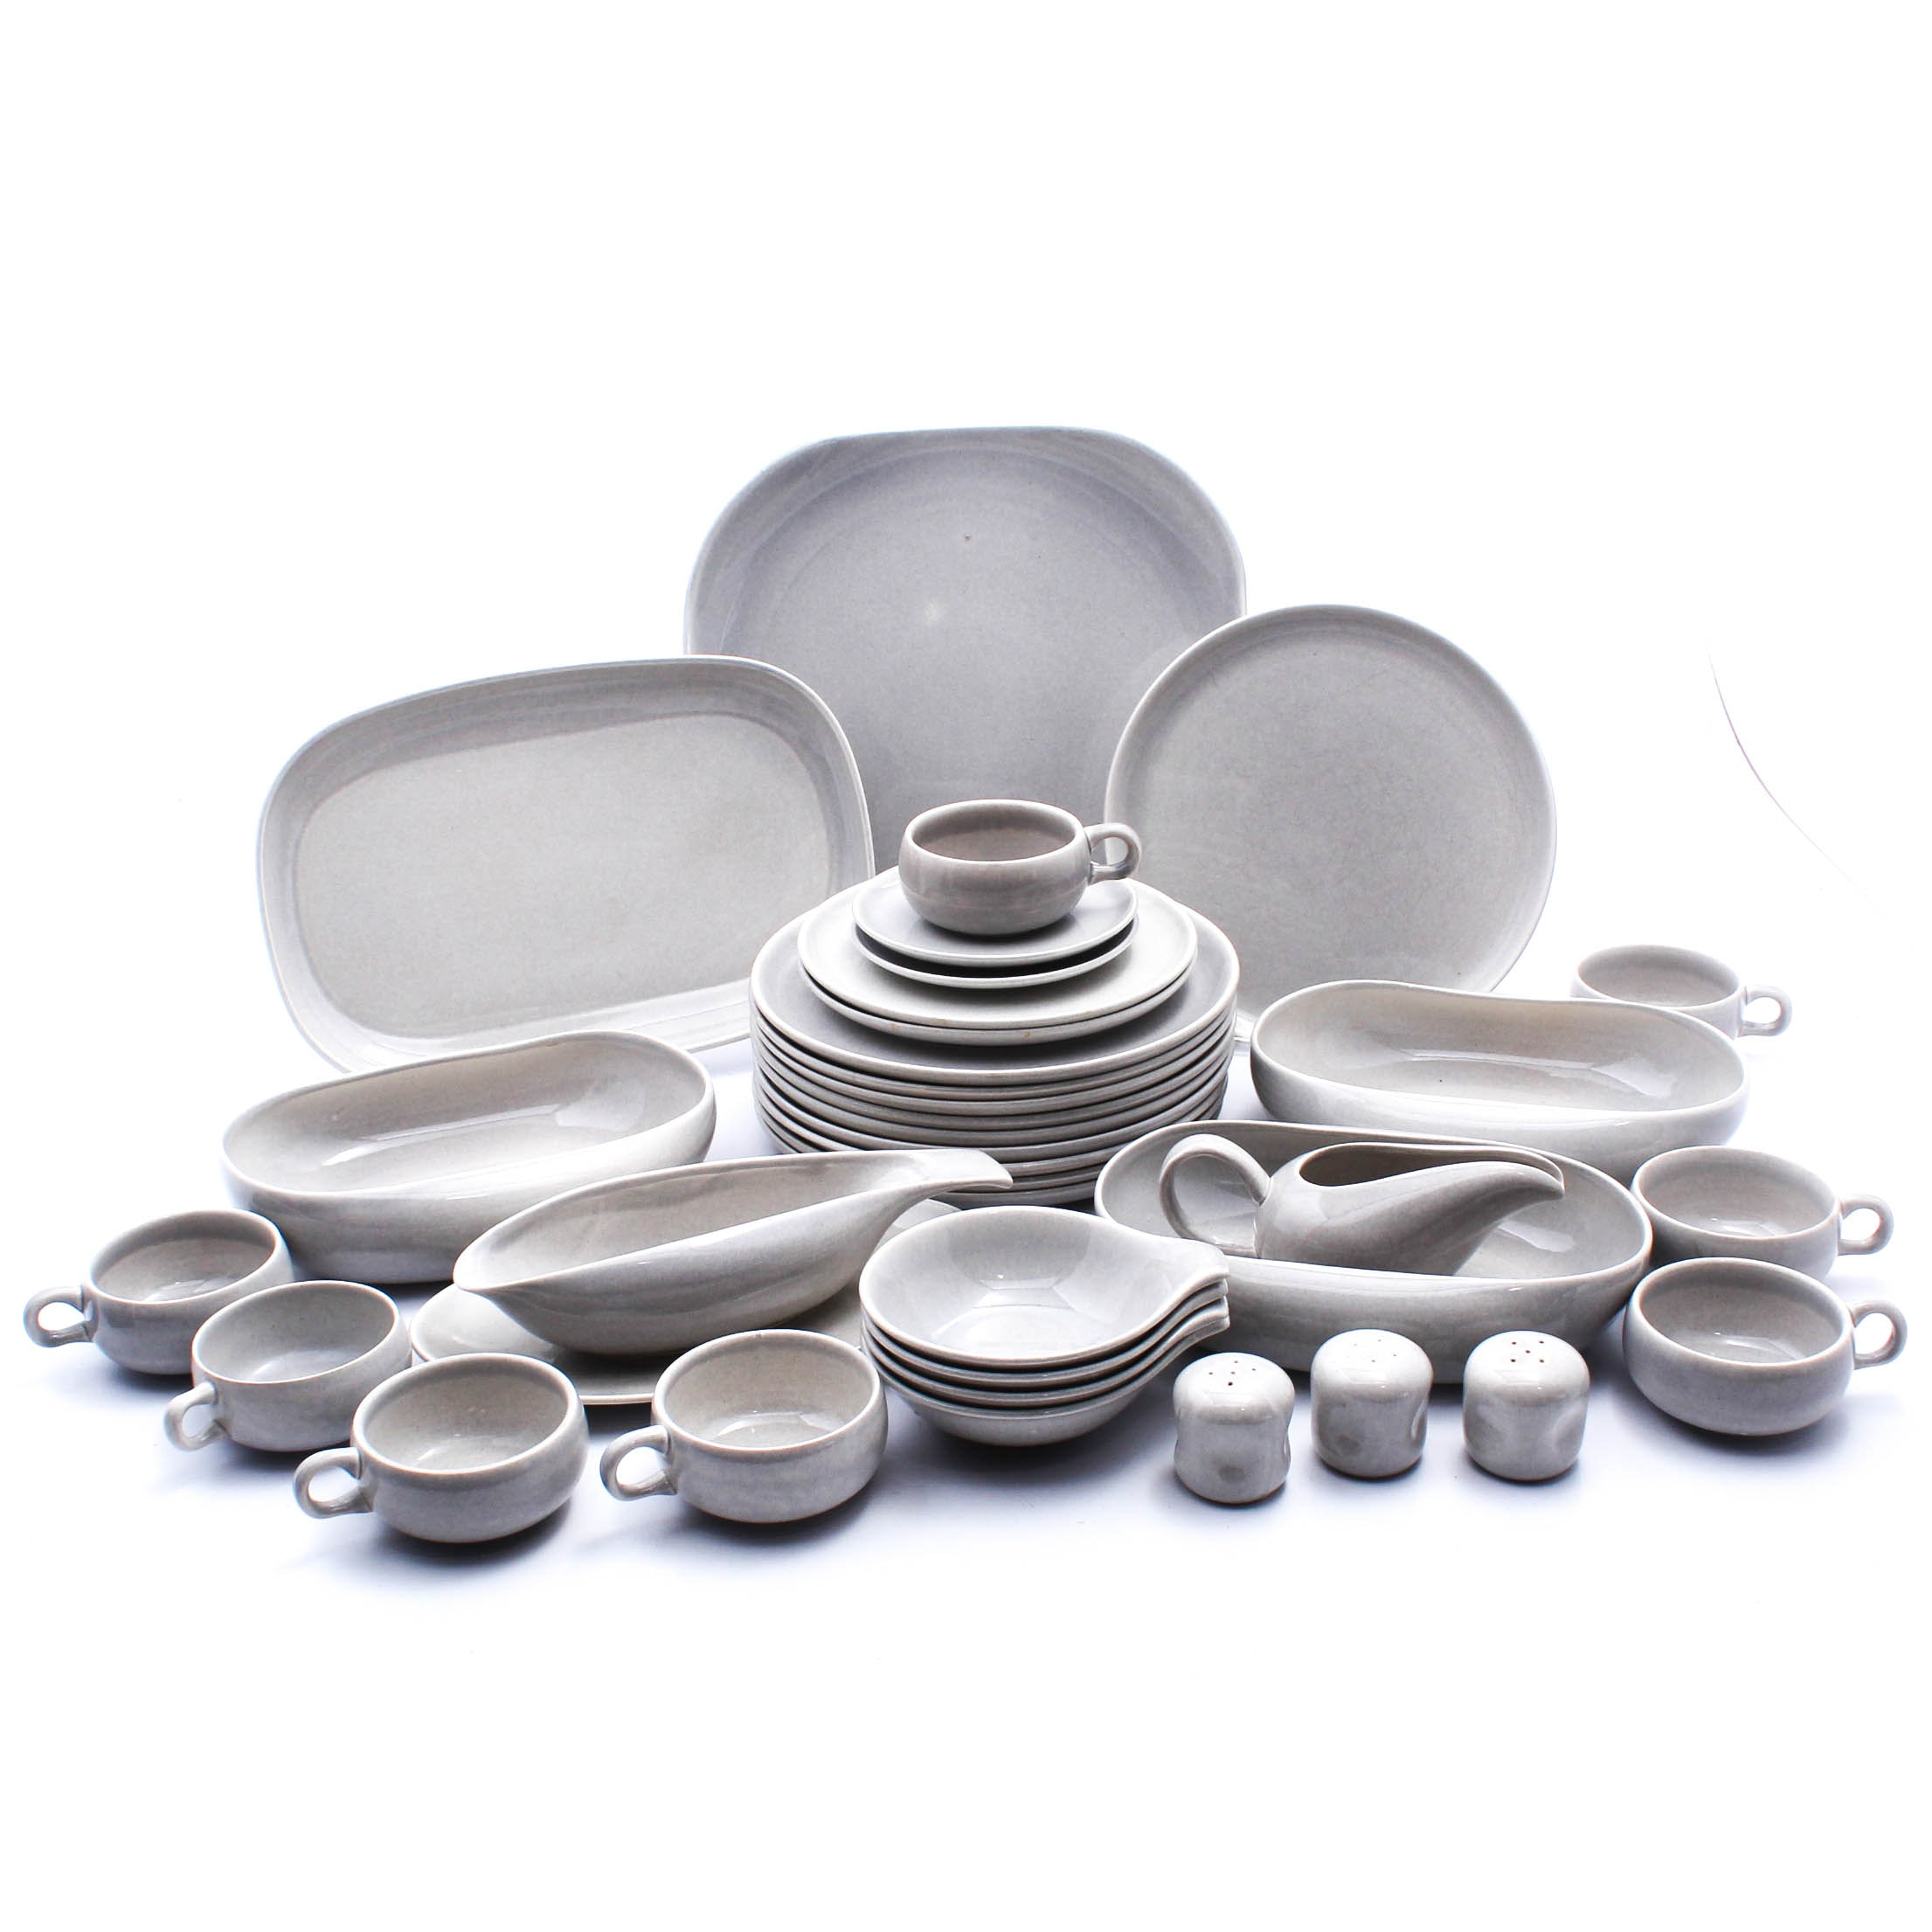 Russel Wright Mid Century Modern Ceramic Tableware